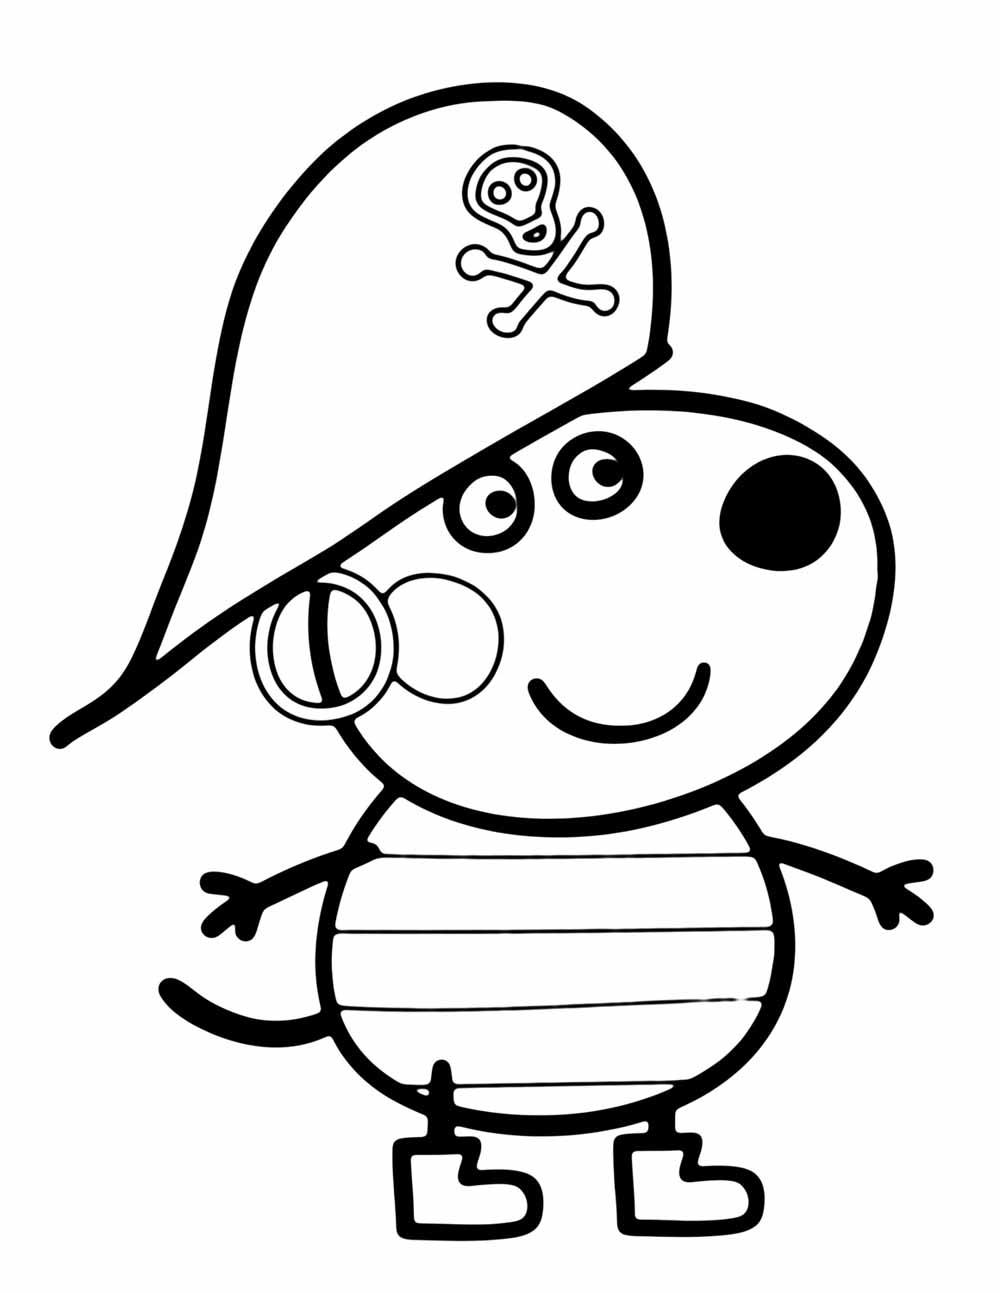 Famoso Pig Para Colorear Elaboración - Dibujos Para Colorear En ...